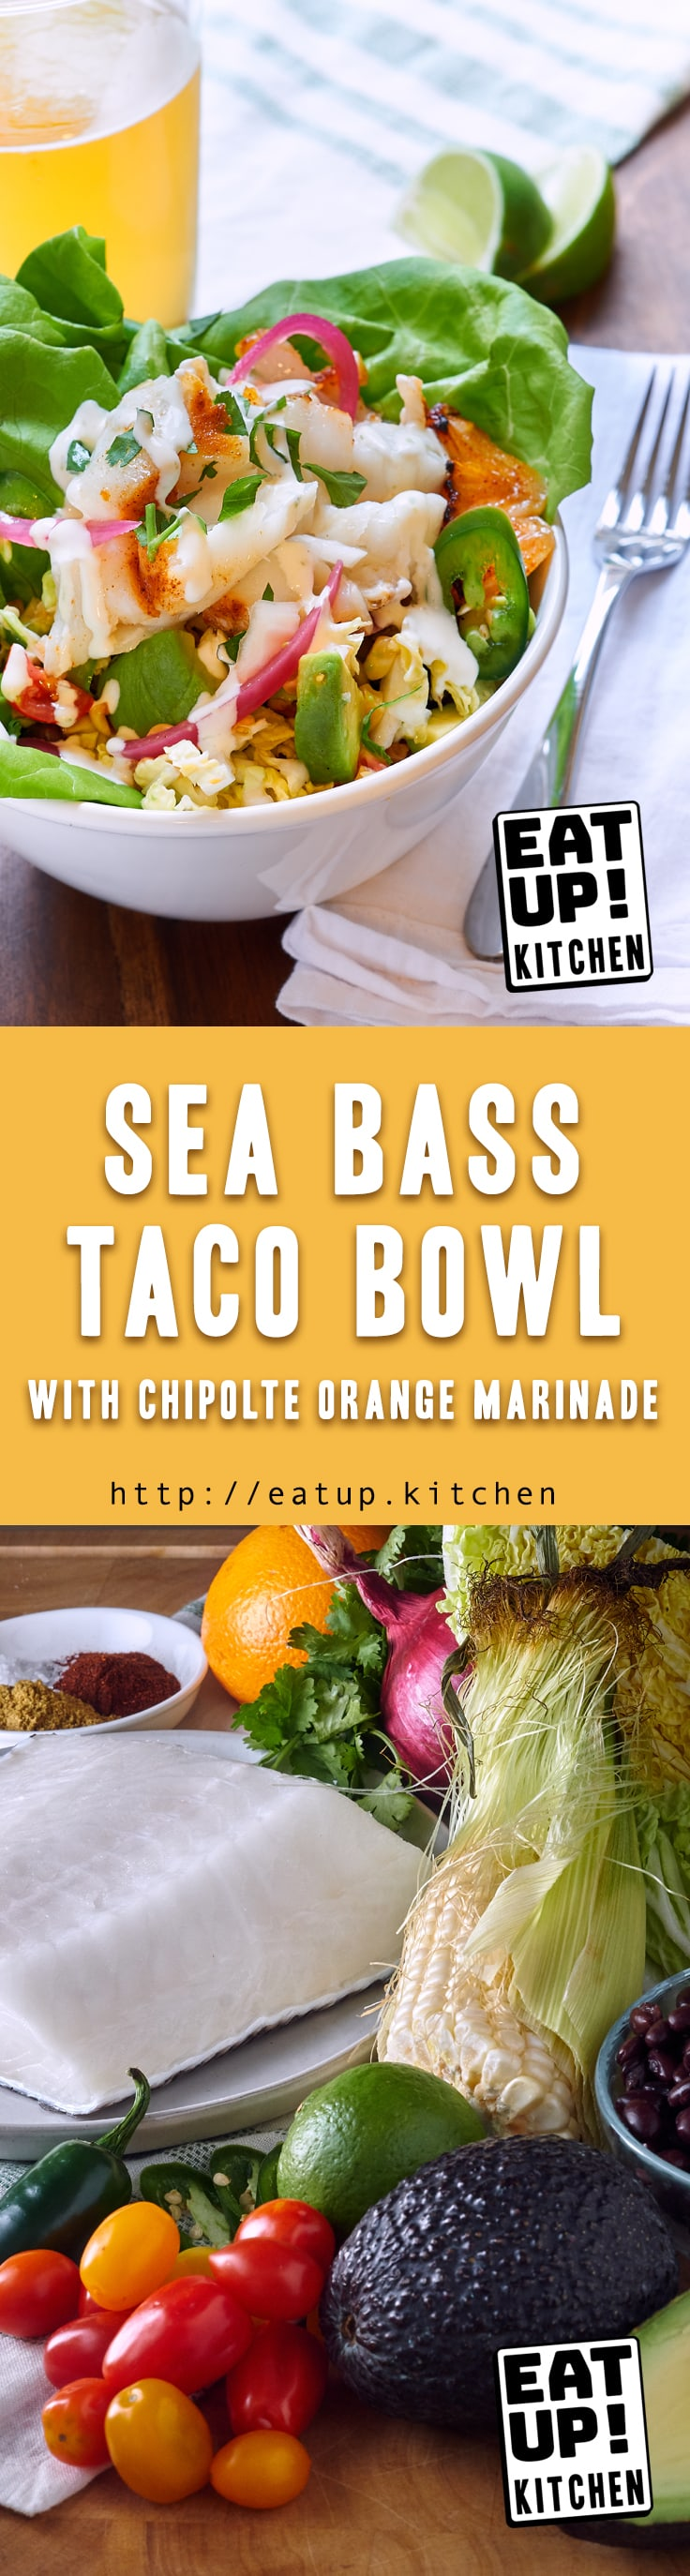 Sea Bass Taco Bowl